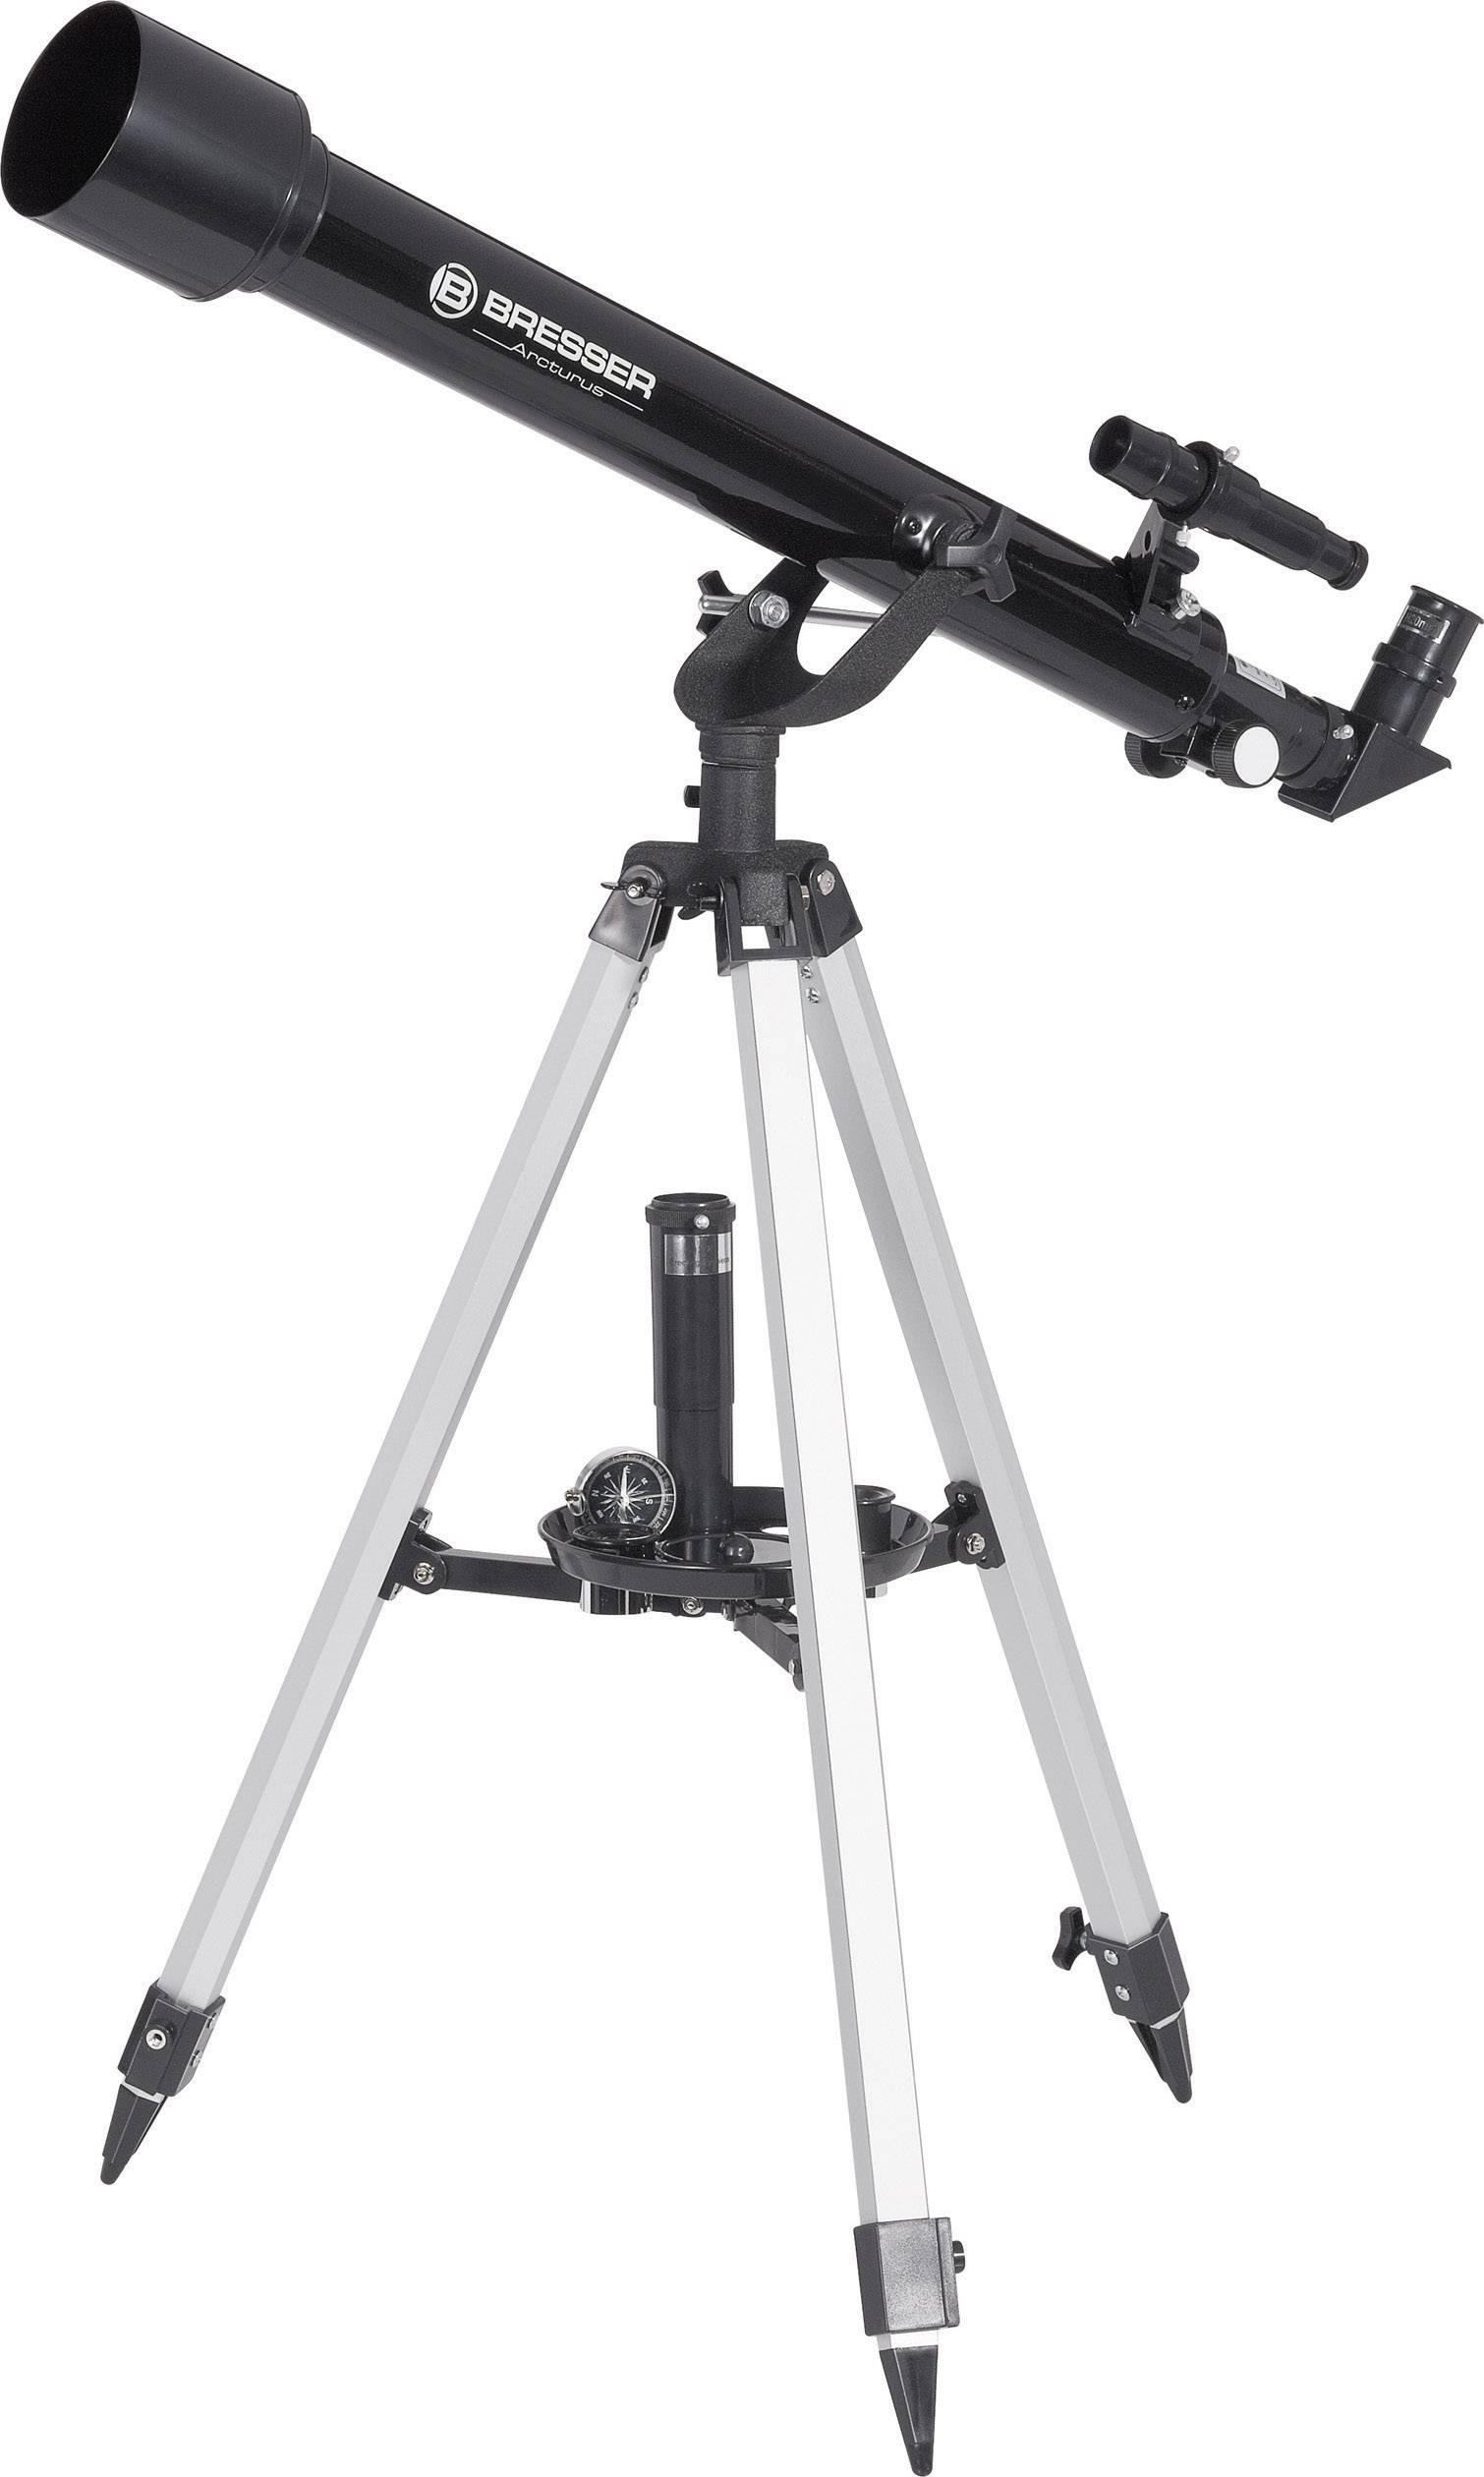 Teleskop Bresser Optik Arcturus 60/700 4511600, 50 do 150 x